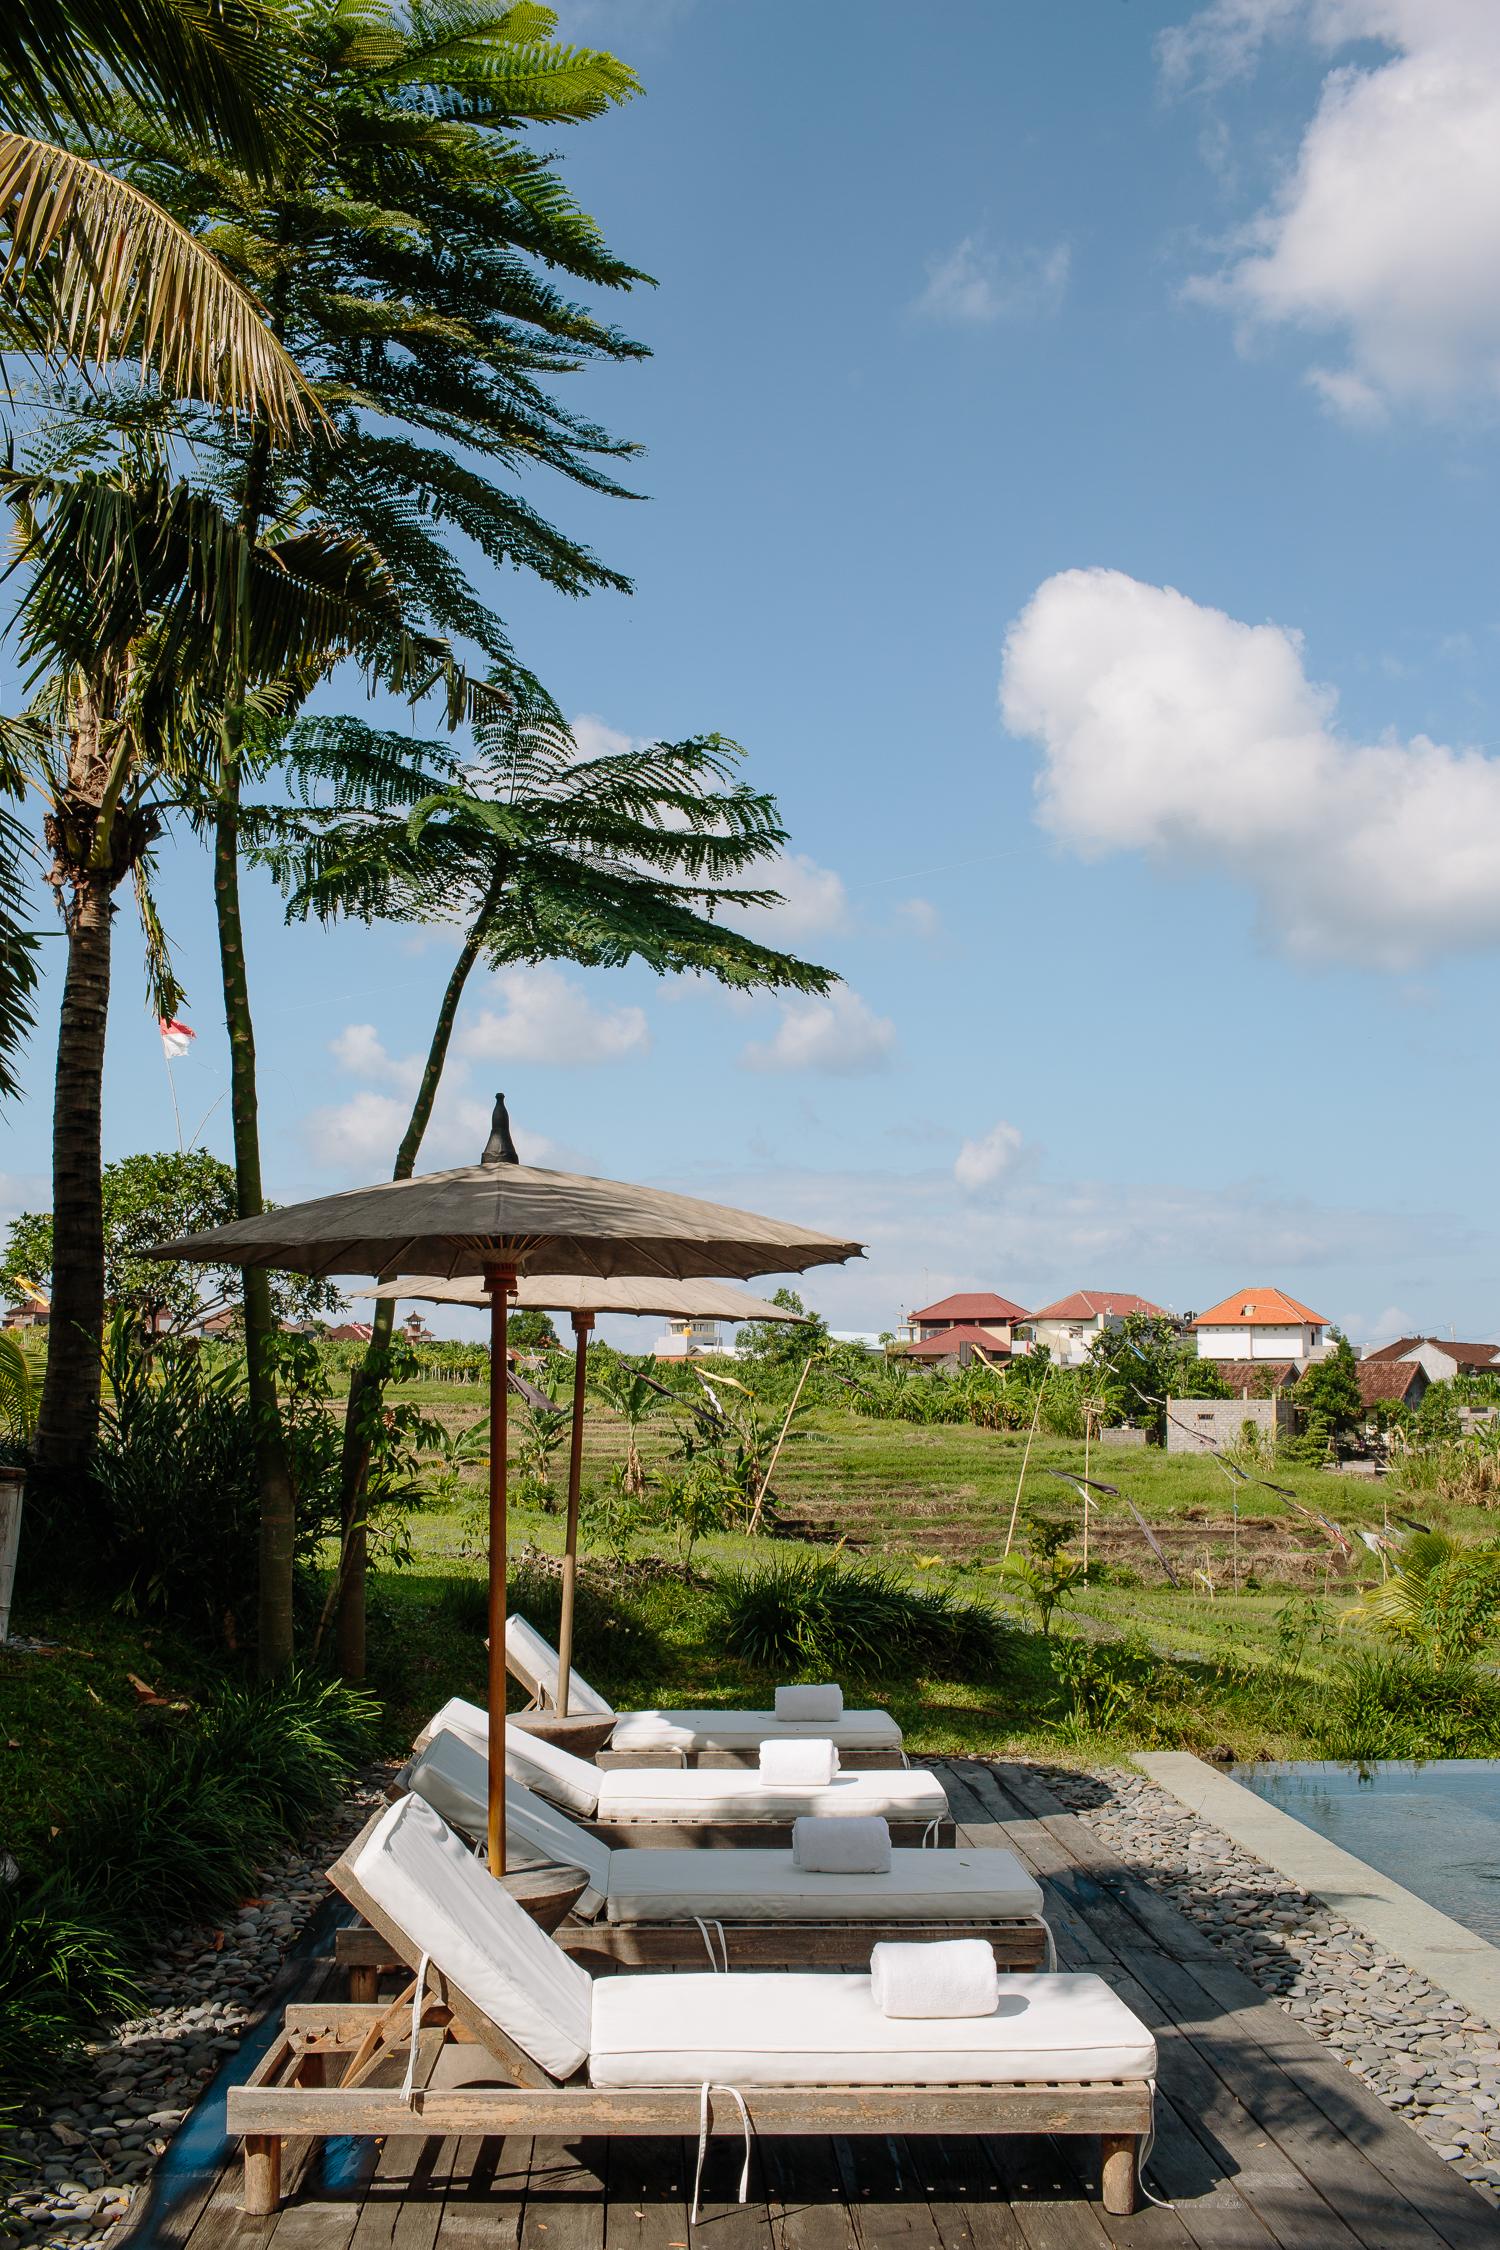 Bali-Kalapa-2016-4891.jpg